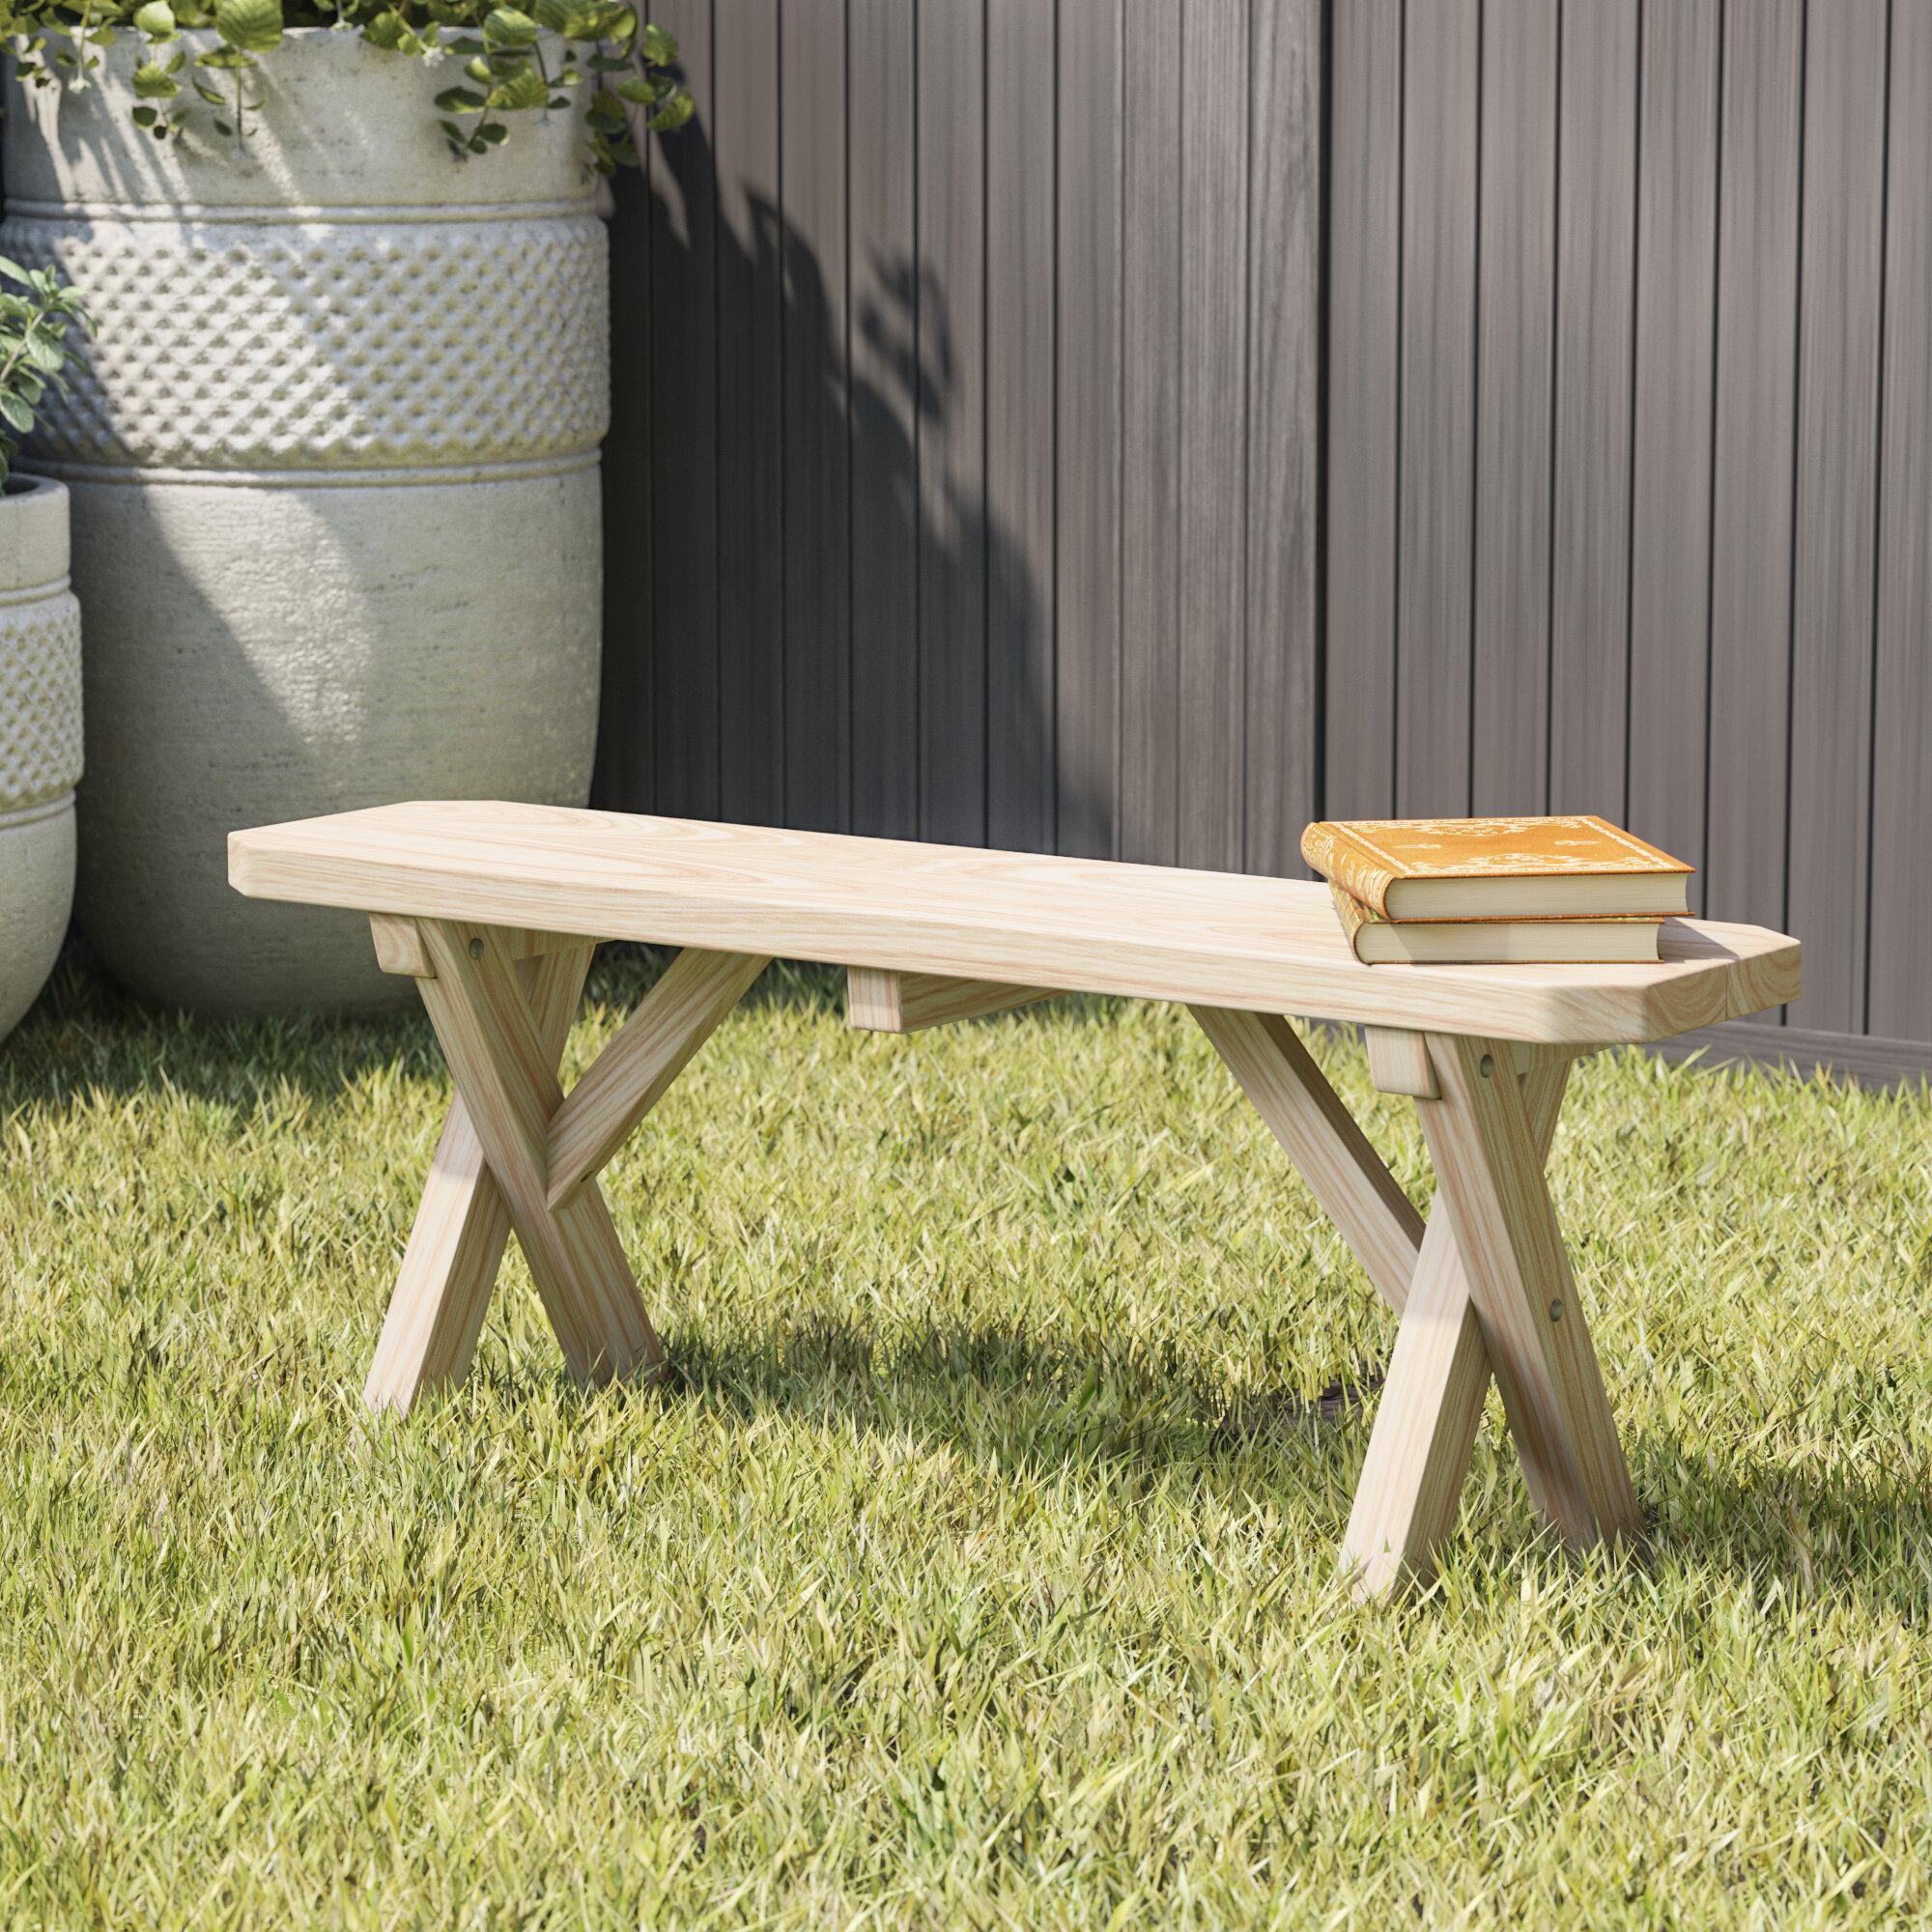 Surprising Loon Peak Sempronius Wood Picnic Bench Reviews Wayfair Evergreenethics Interior Chair Design Evergreenethicsorg